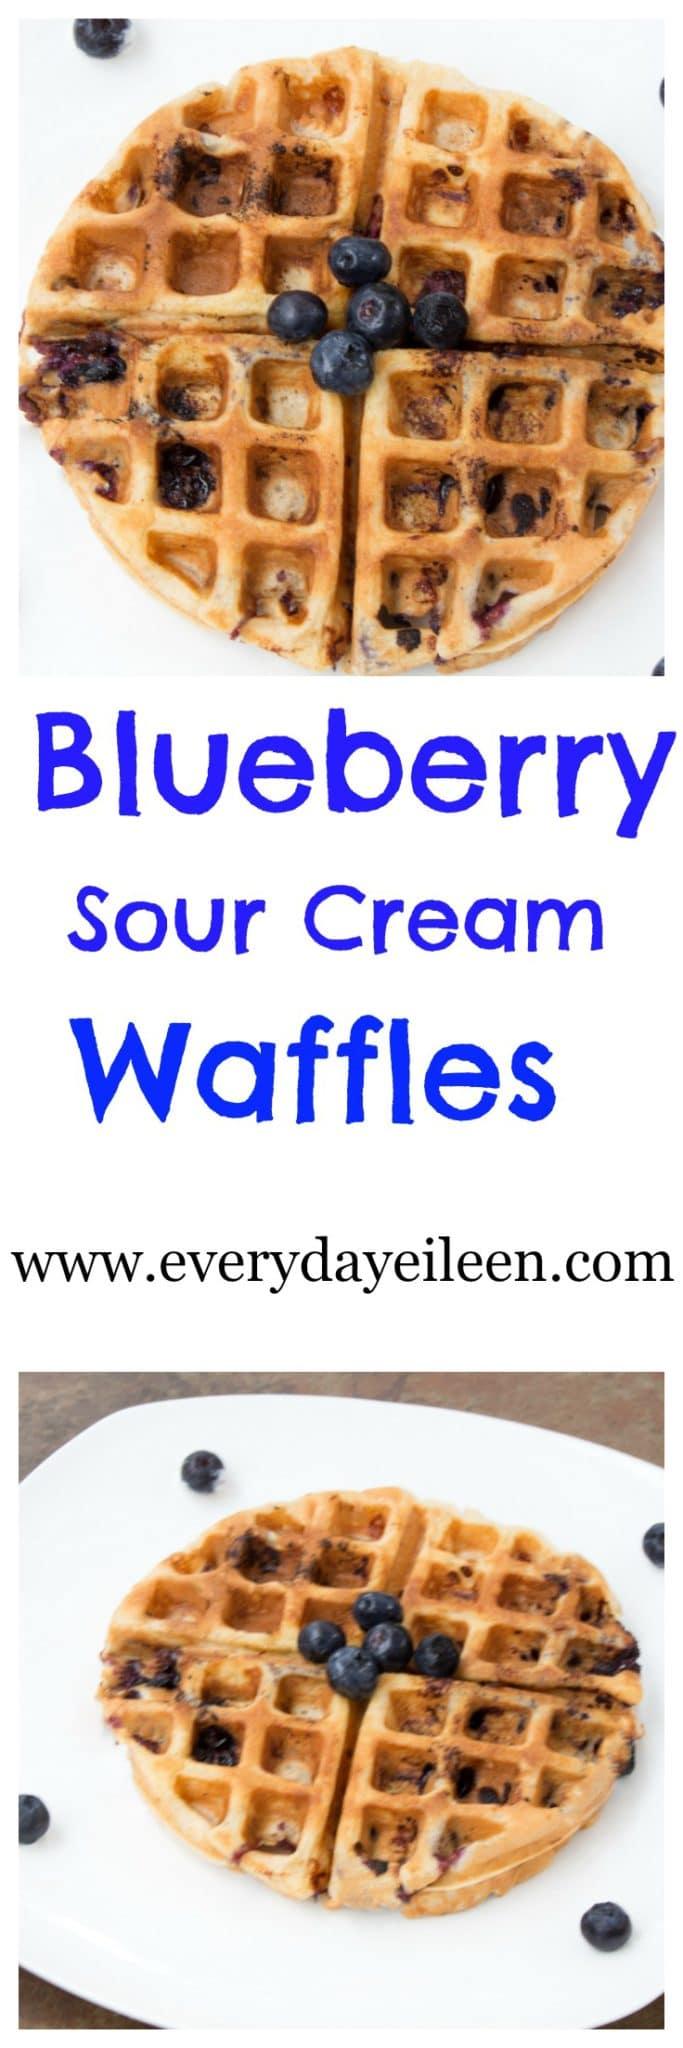 blueberry sour cream waffle